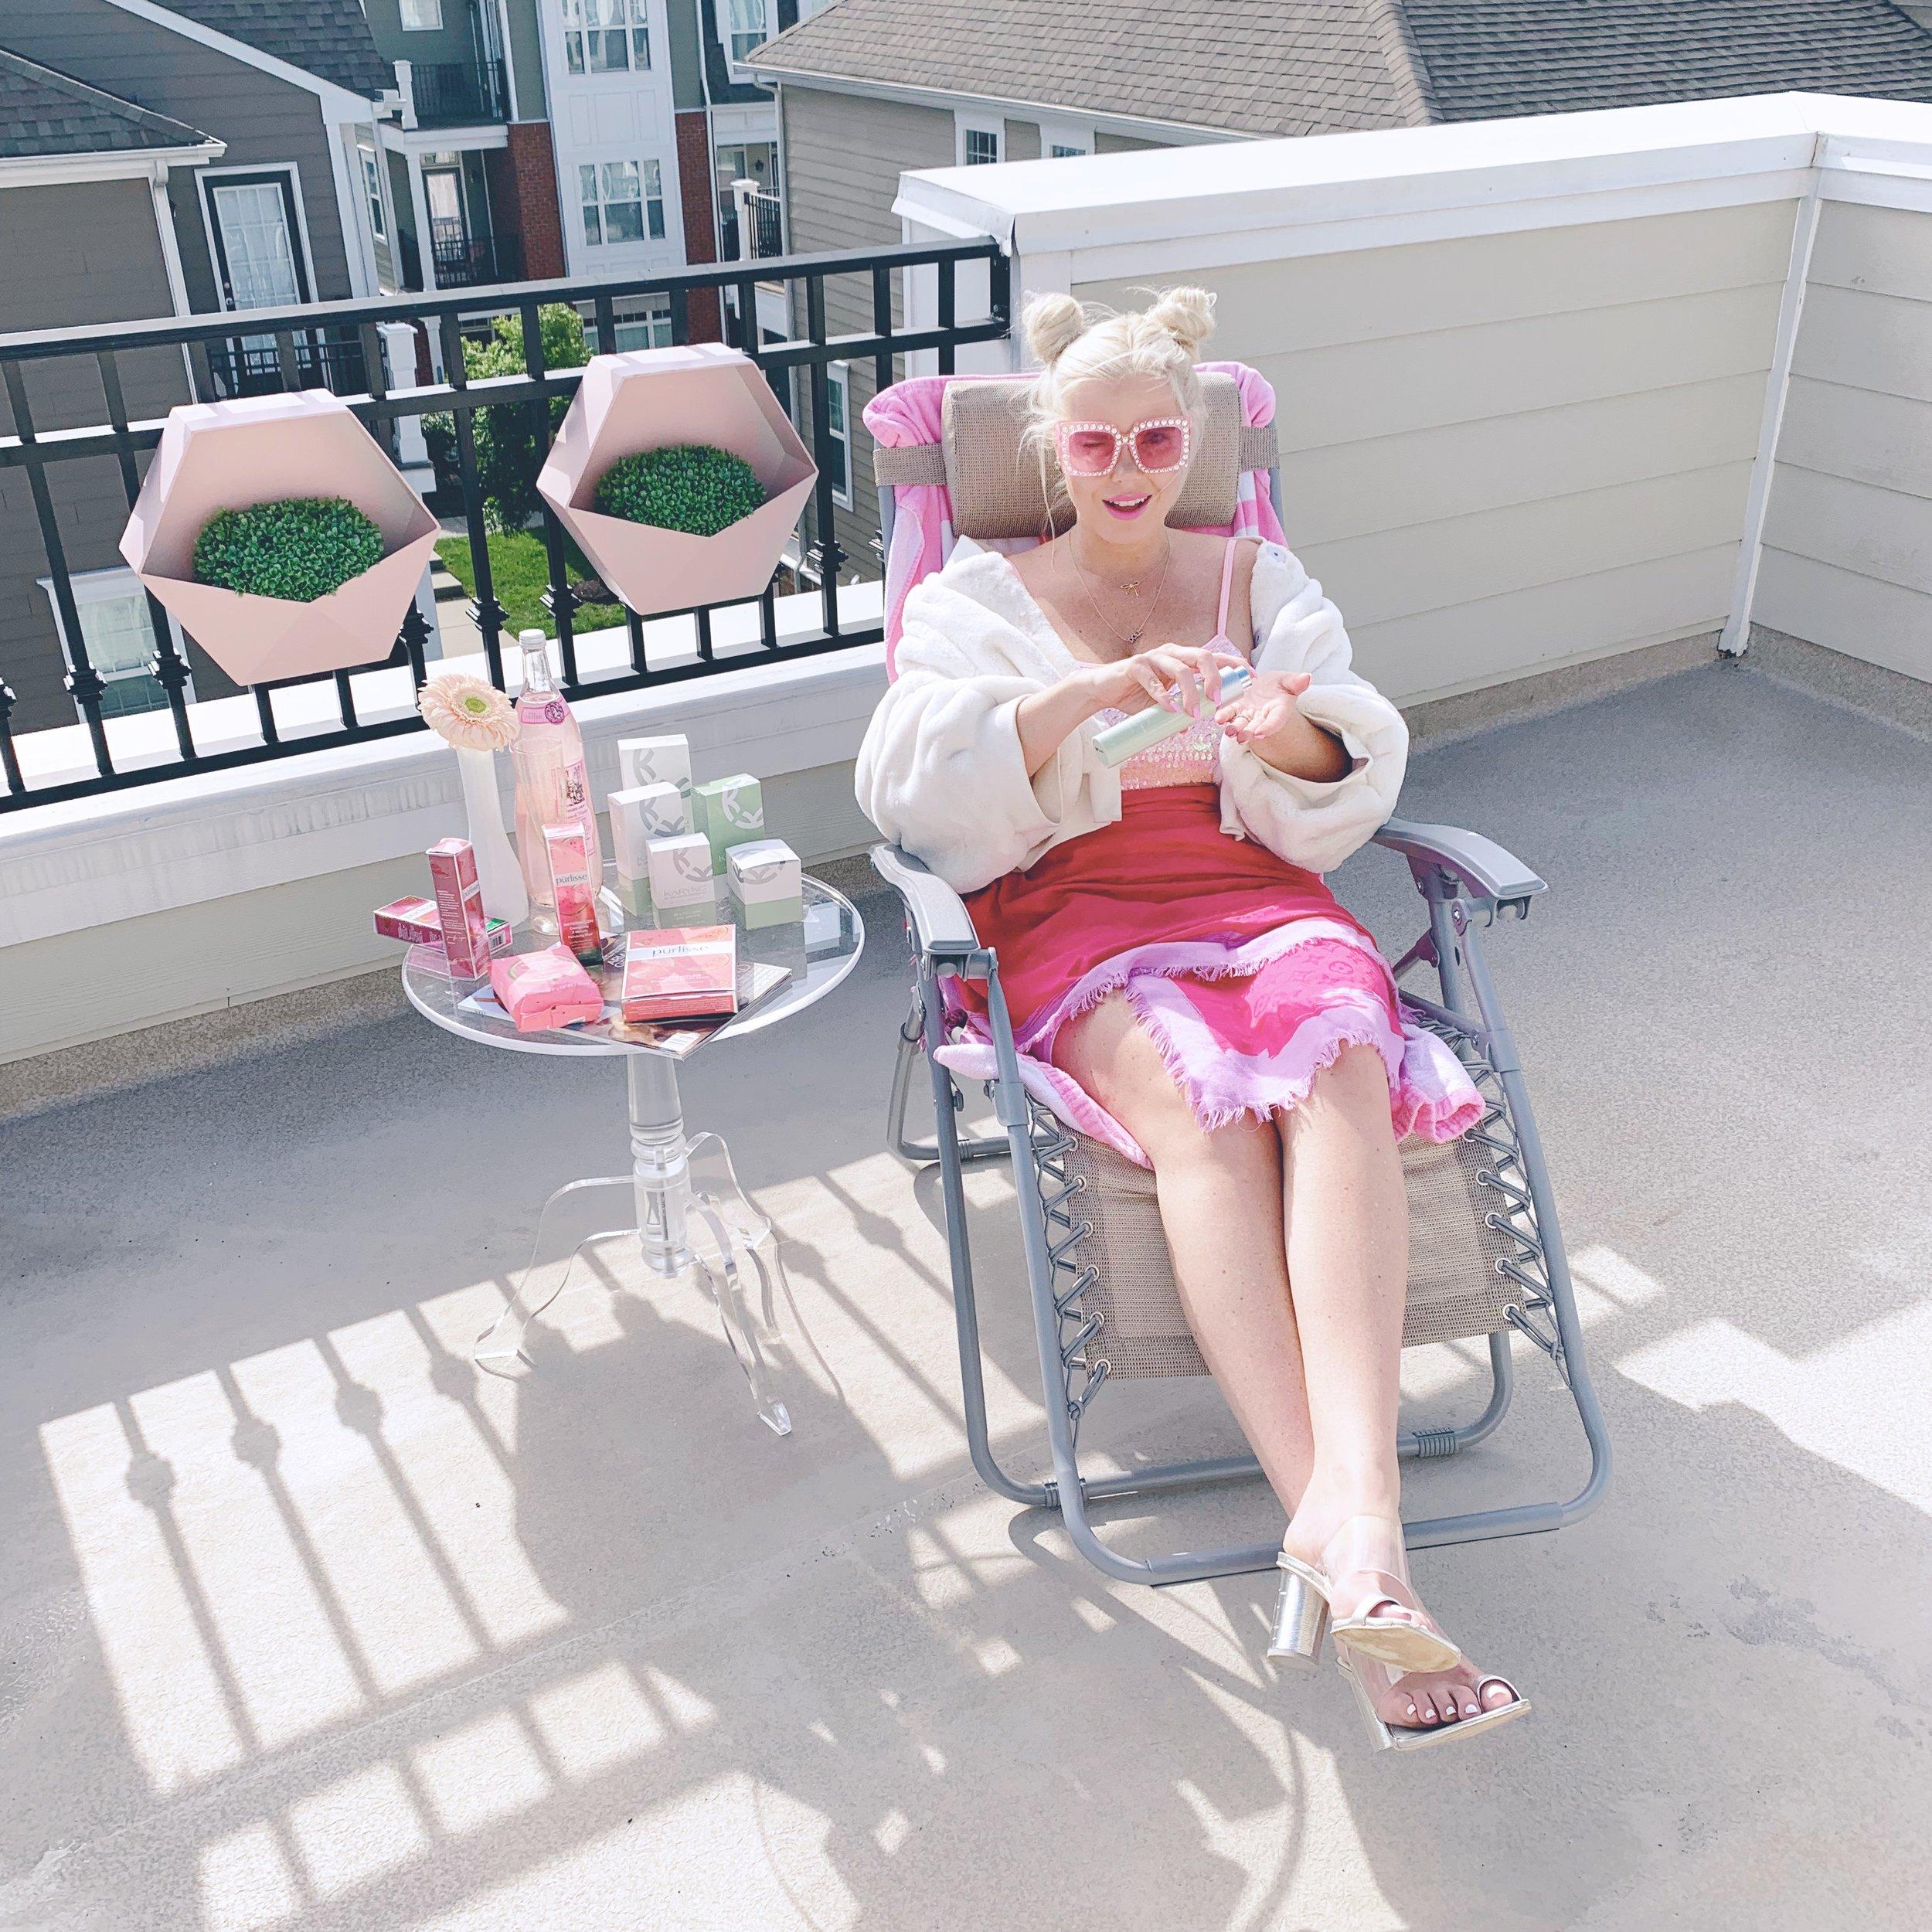 the-caroline-doll-blog-self-care-day-2019-karyng-purlisse..JPG